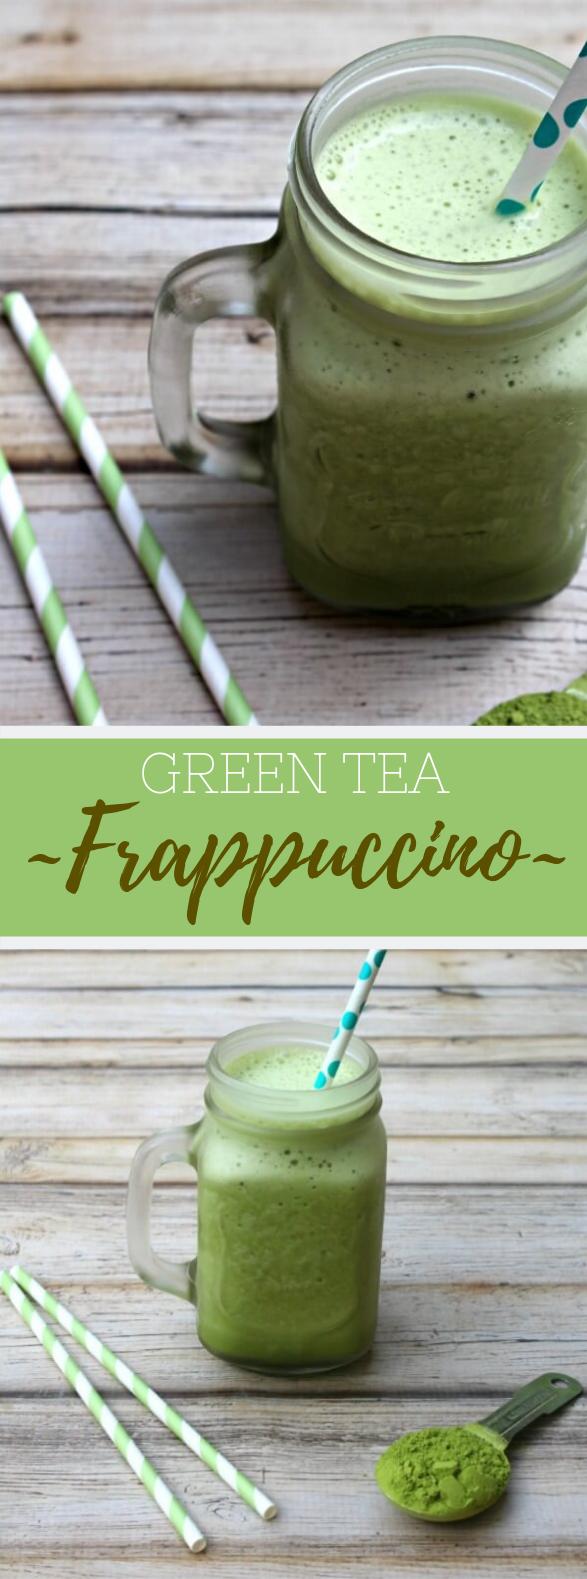 Green Tea Frappuccino Recipe #Drink #Lowsugar